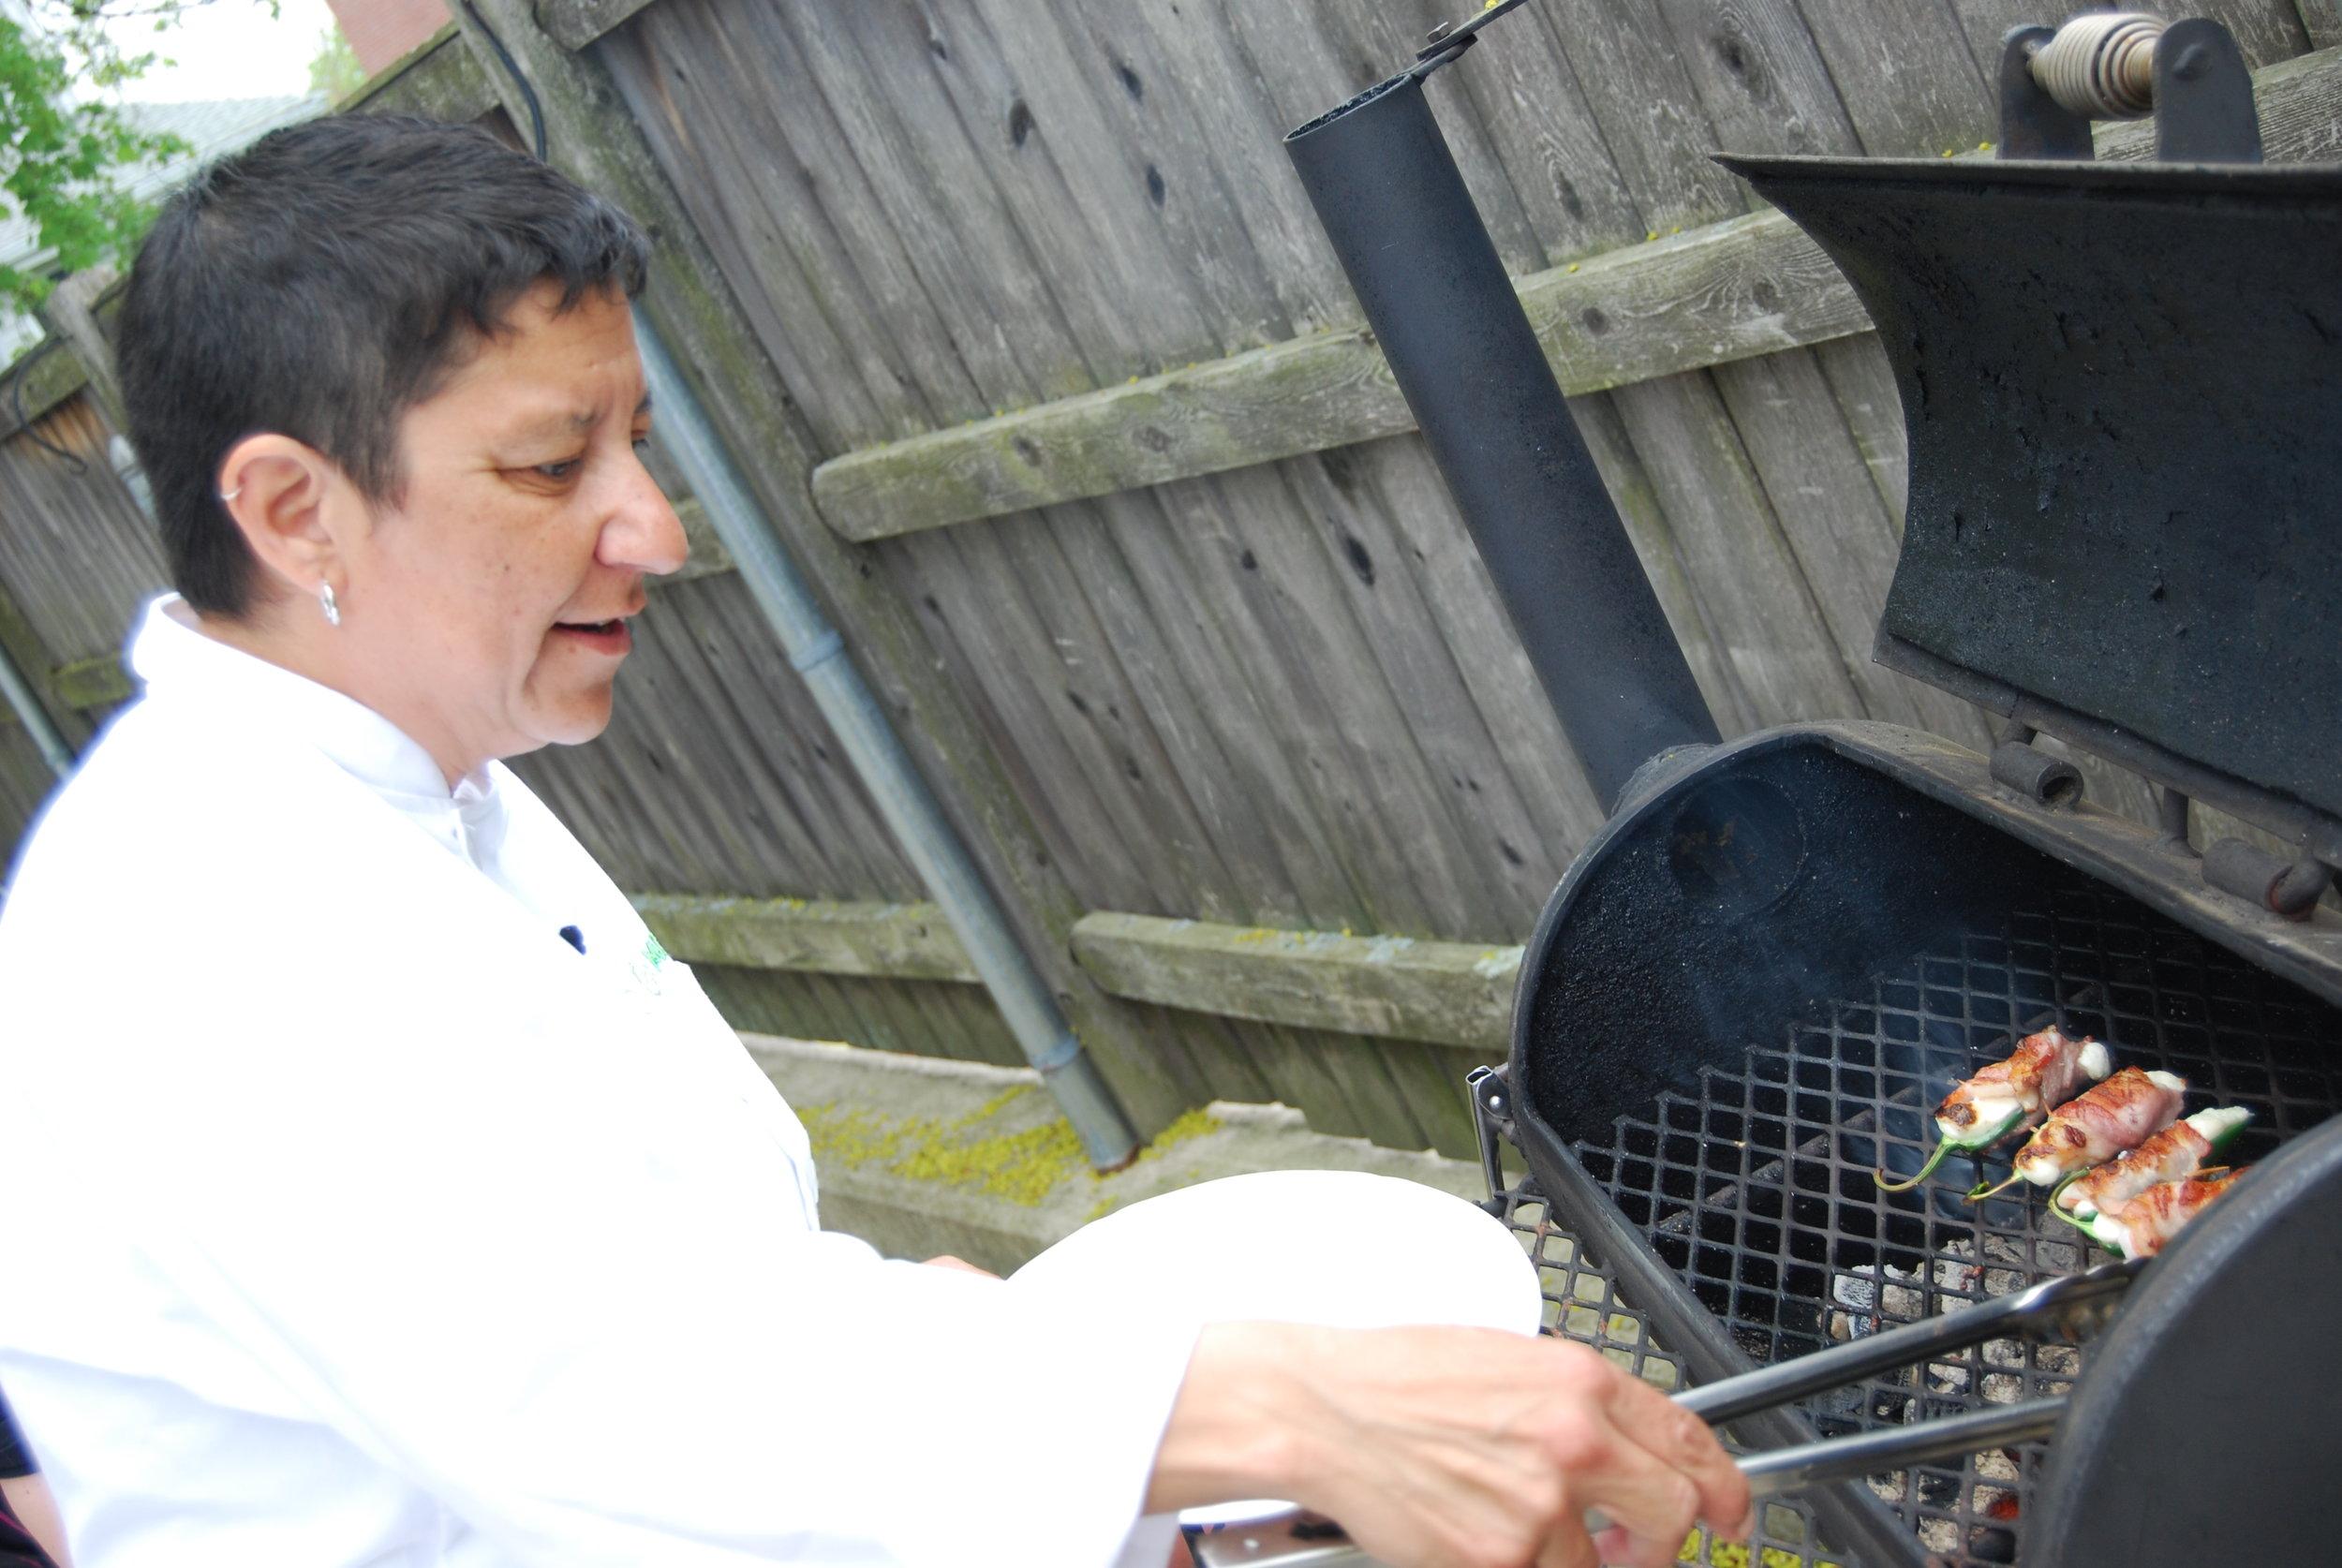 jalapeno_poppers_amanda_grilling.JPG